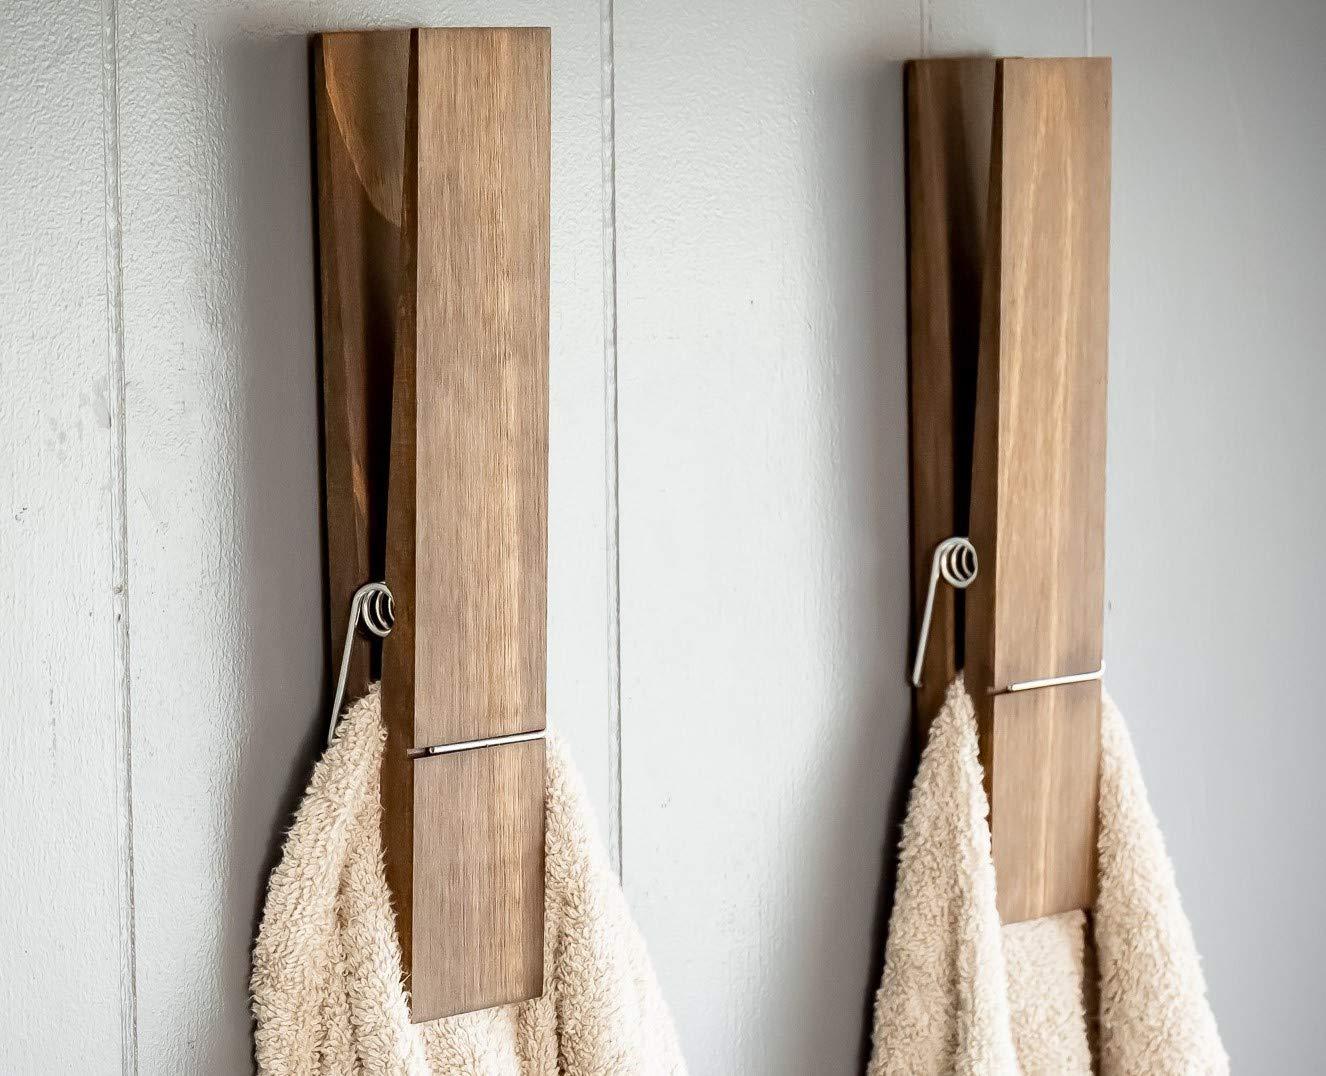 "Jumbo Clothespin Bathroom Towel Holder, 1 Clothespin, Jacobean, 12"" clothespin, farmhouse bathroom decor, laundry room decor, nursery decor, towel hook"